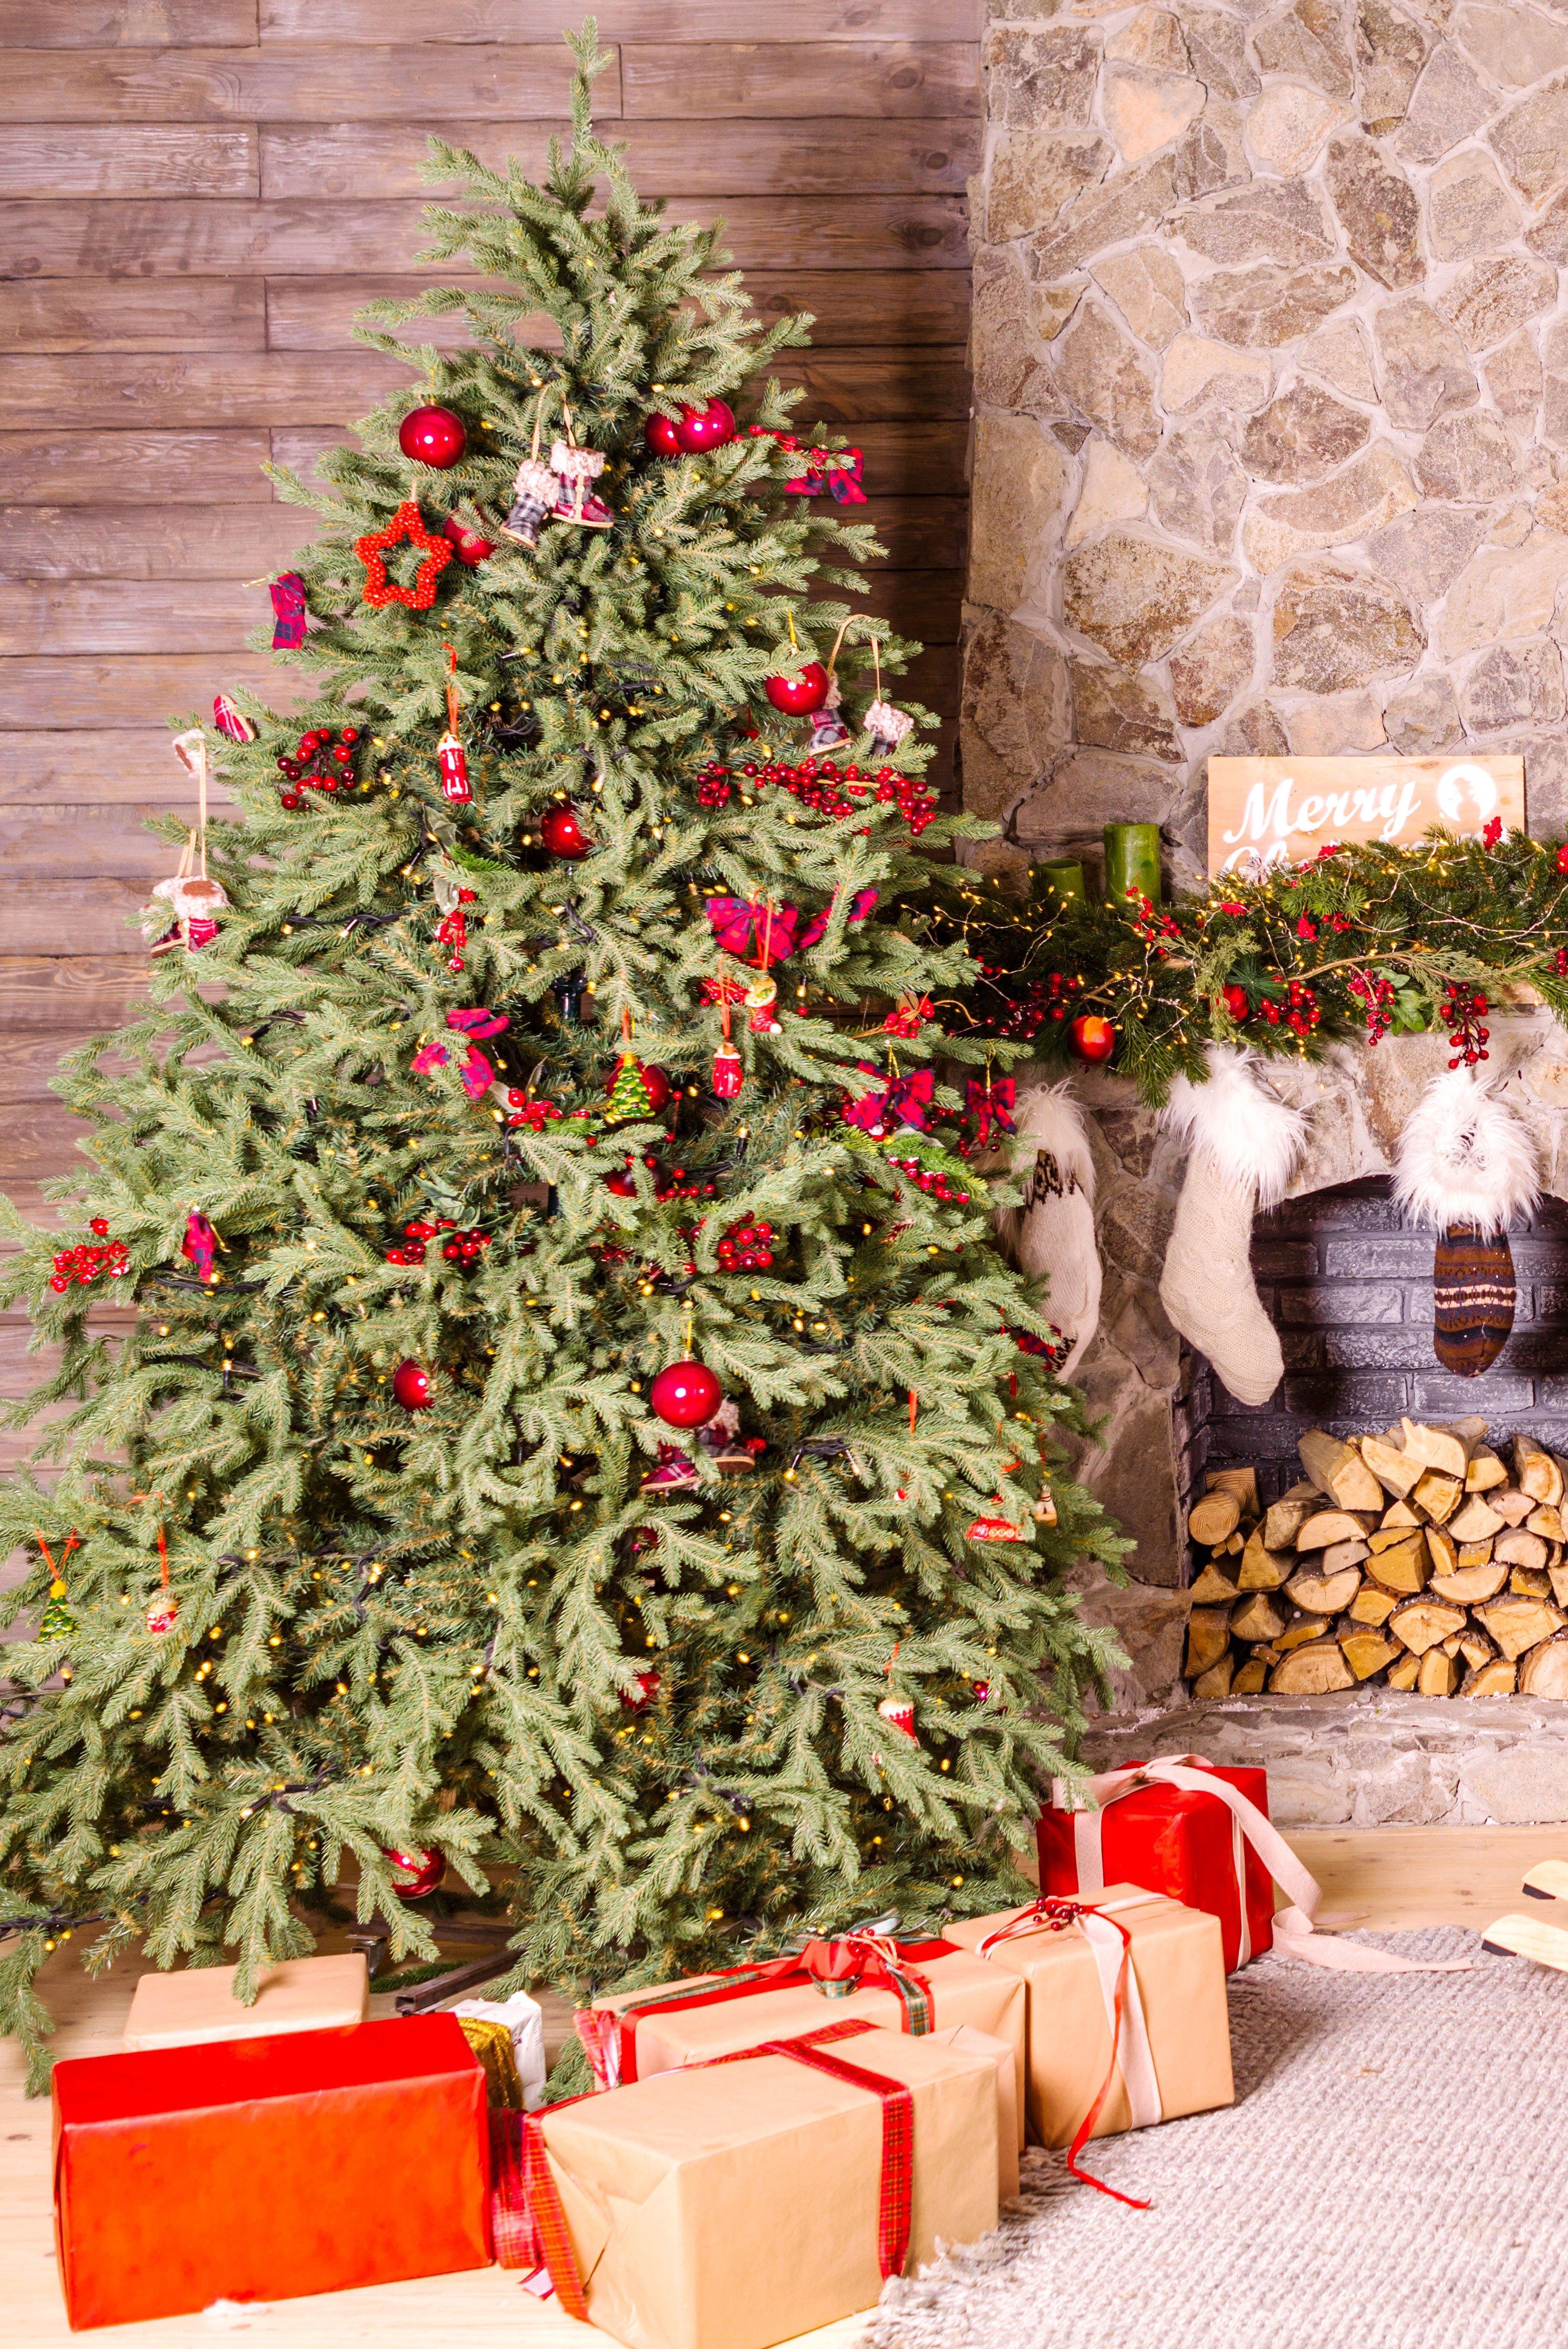 Stocking-Stuffers---Photo-by-Євгенія-Височина